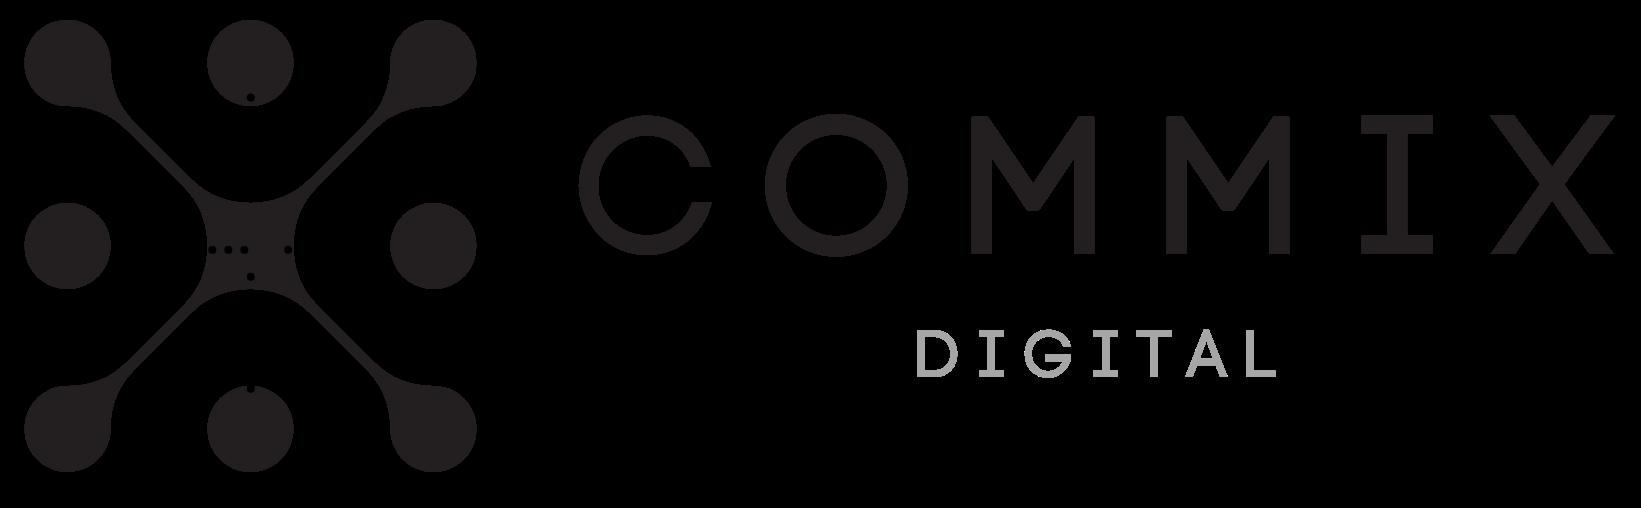 Commix Digital